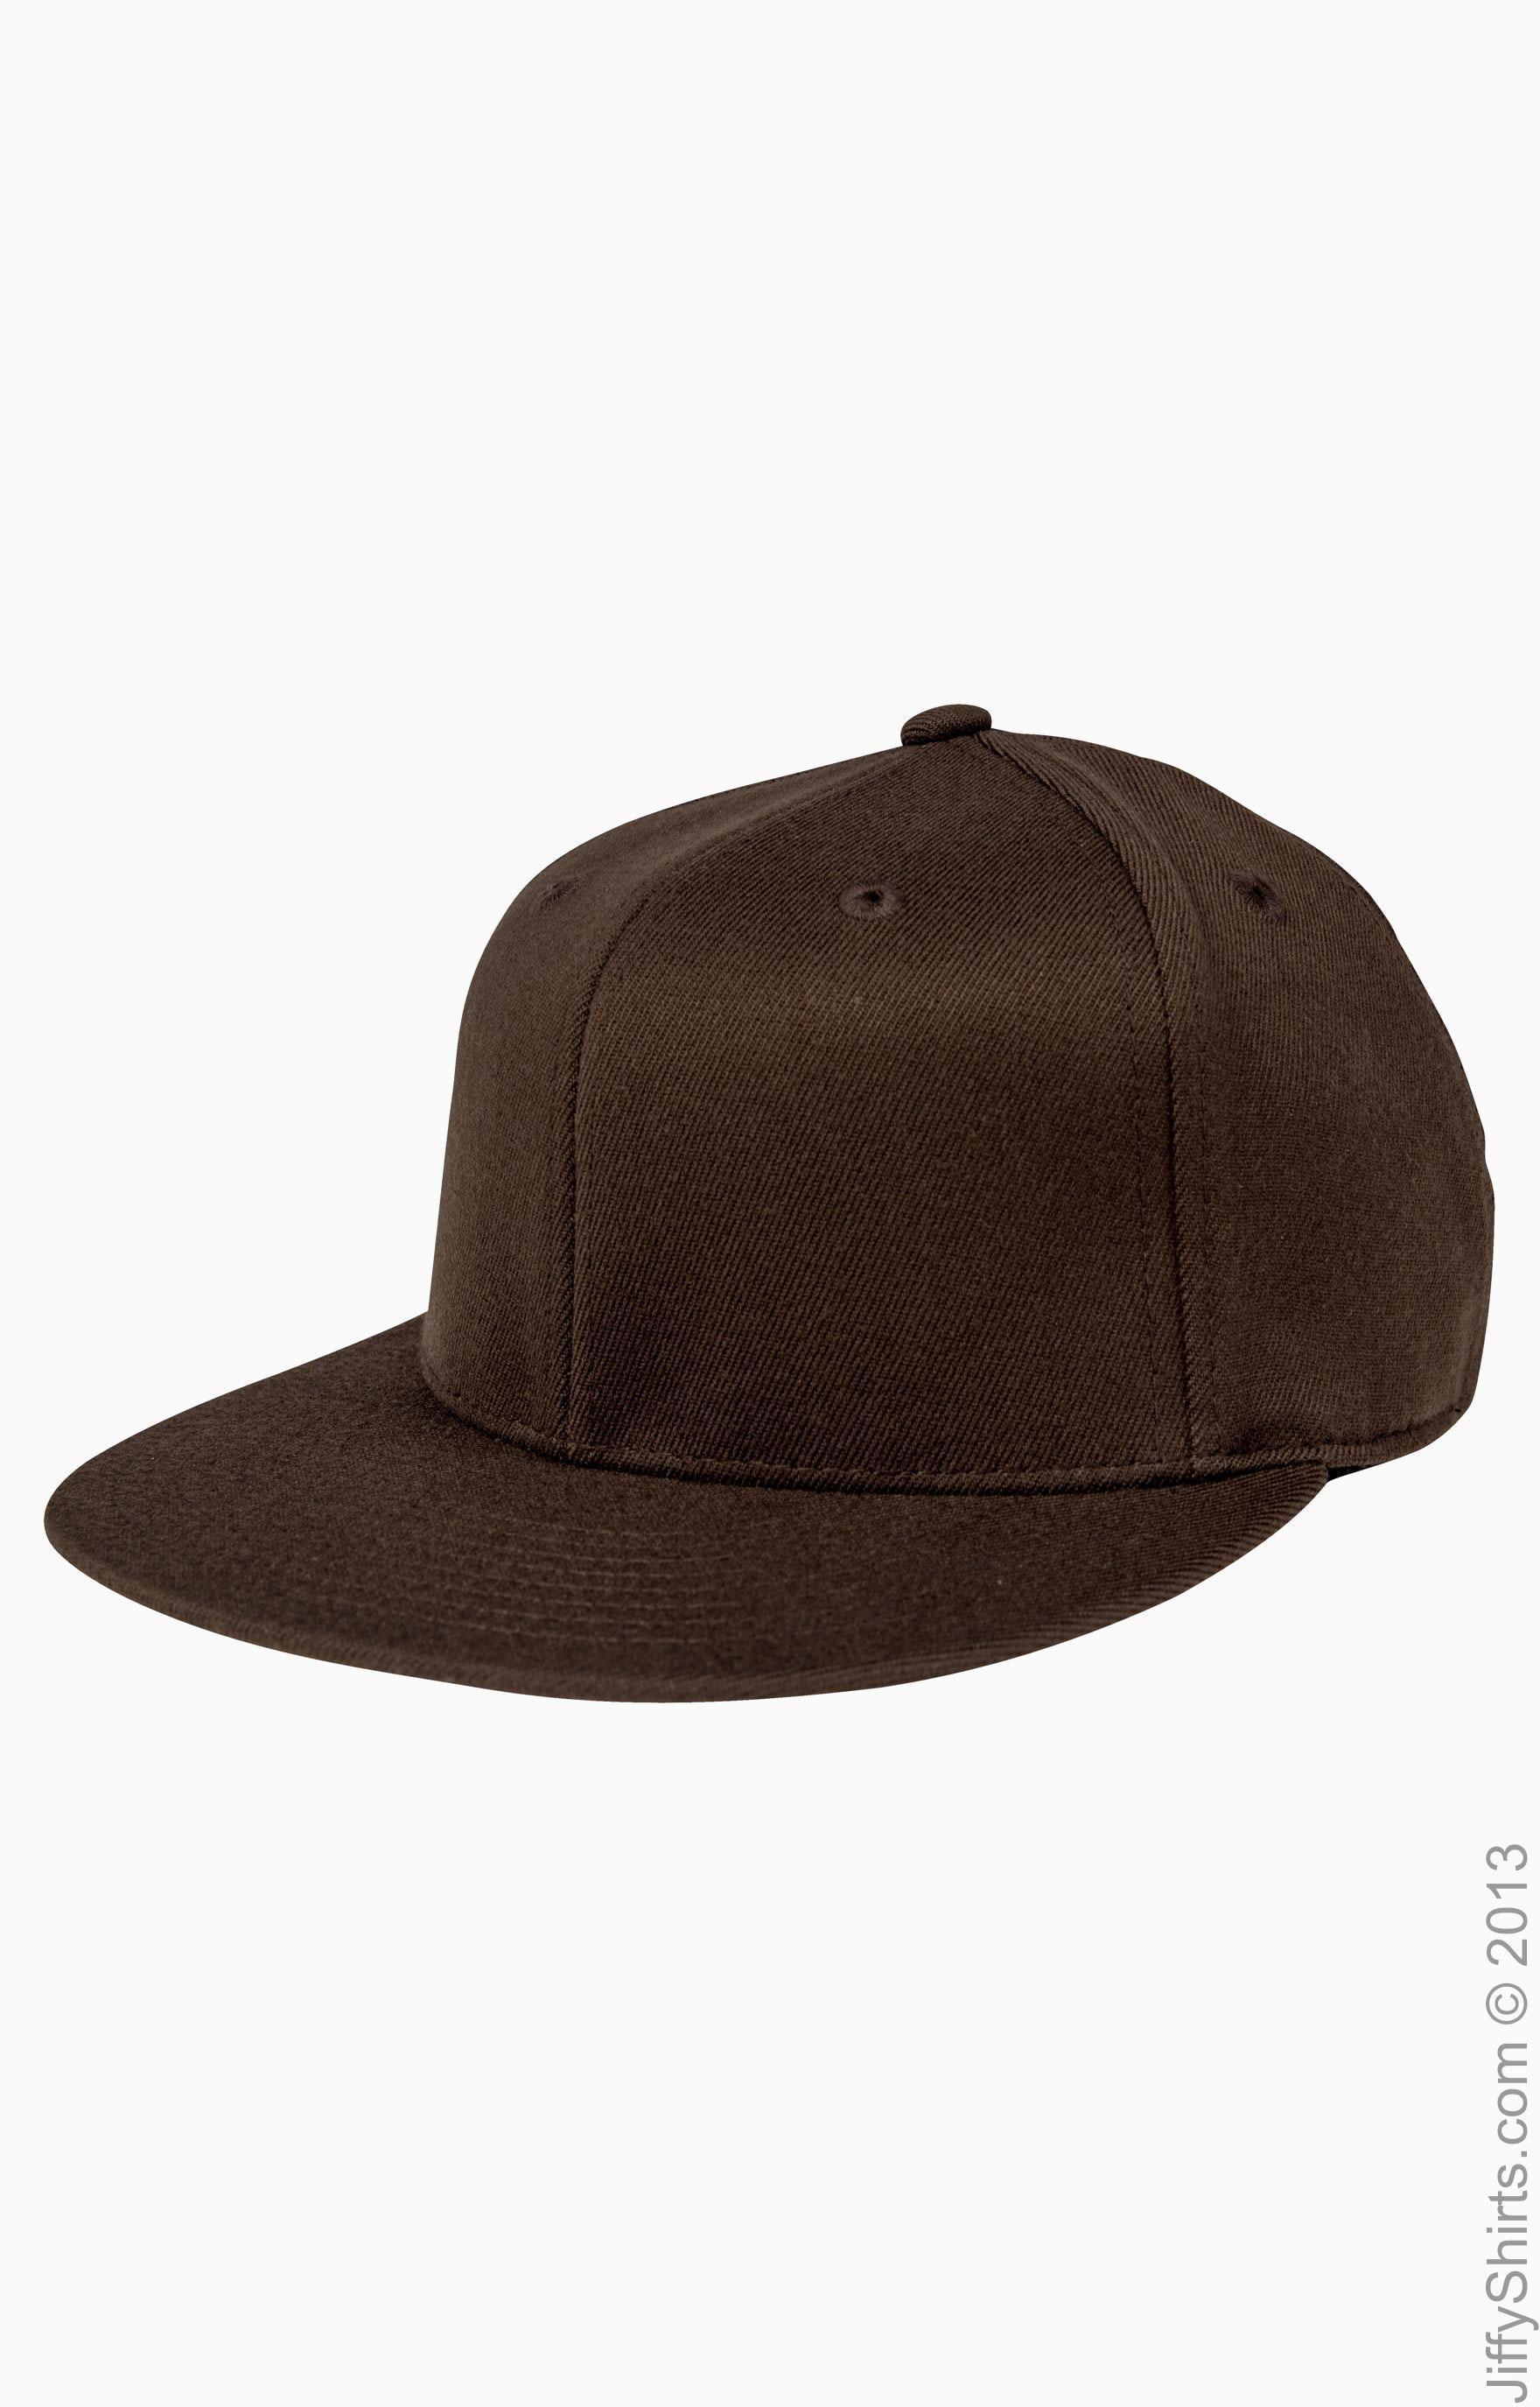 6210 - Brown